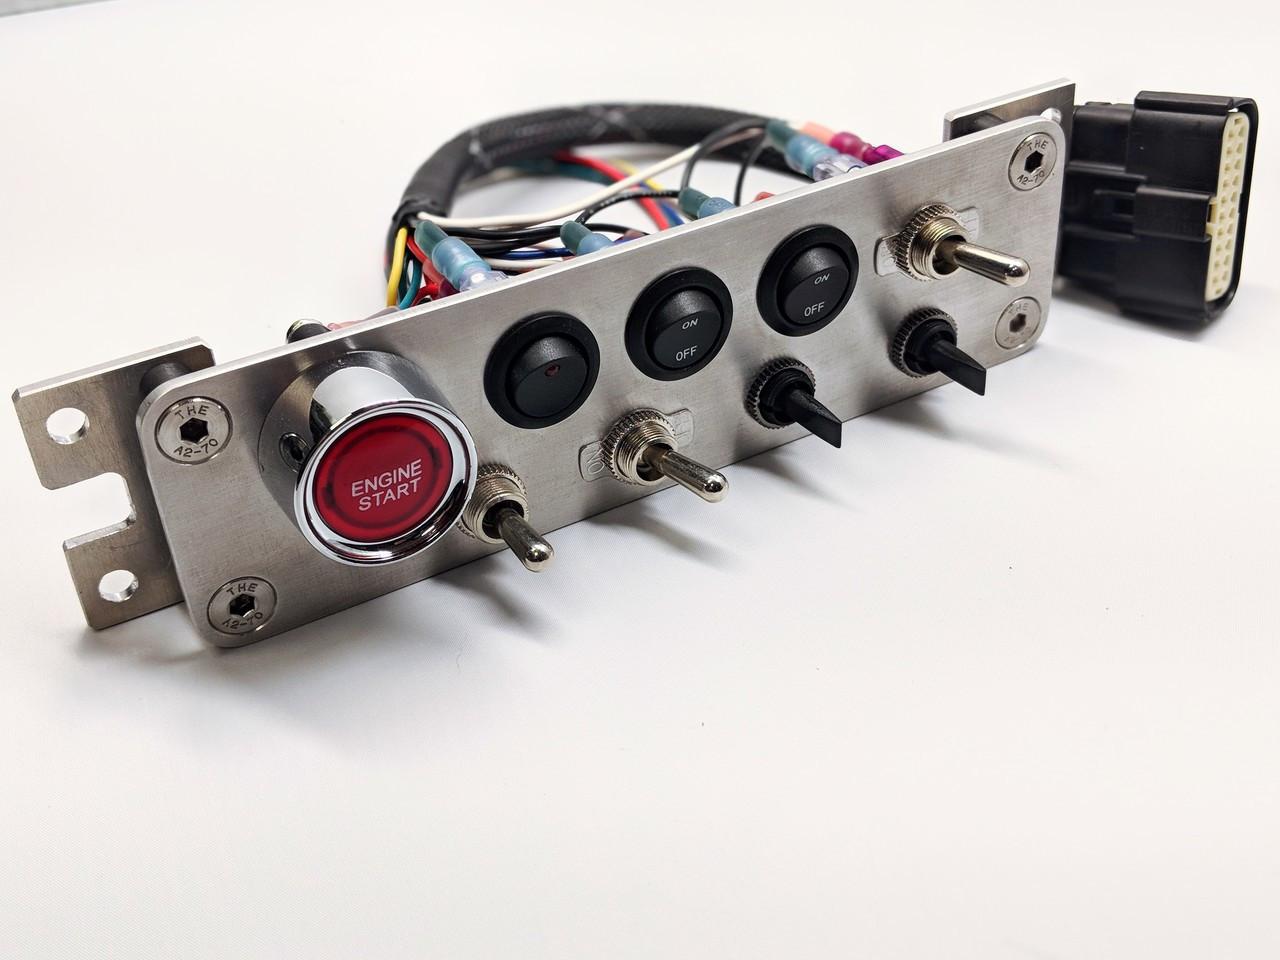 240sx wiring harness in car wiring diagram sheet 240sx wiring harness in car [ 1280 x 960 Pixel ]